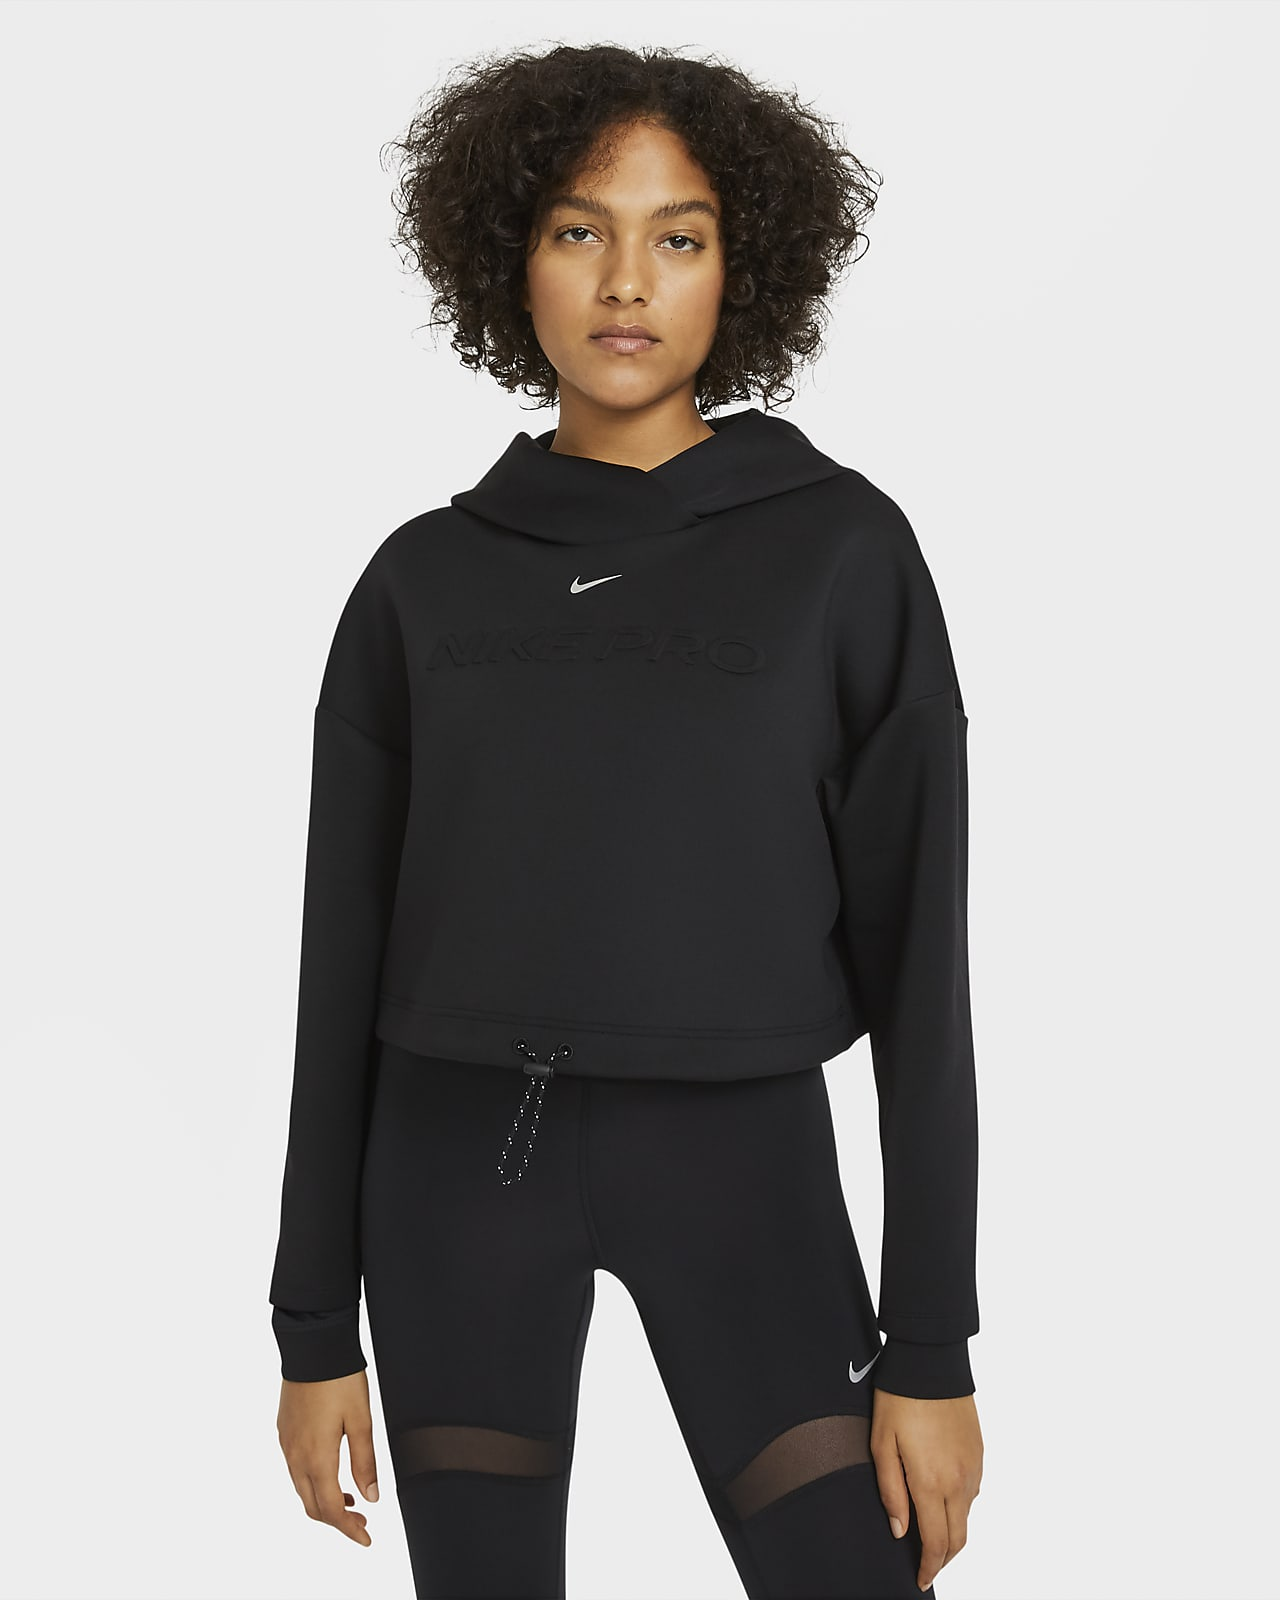 Nike Pro Kadın Kapüşonlu Üstü